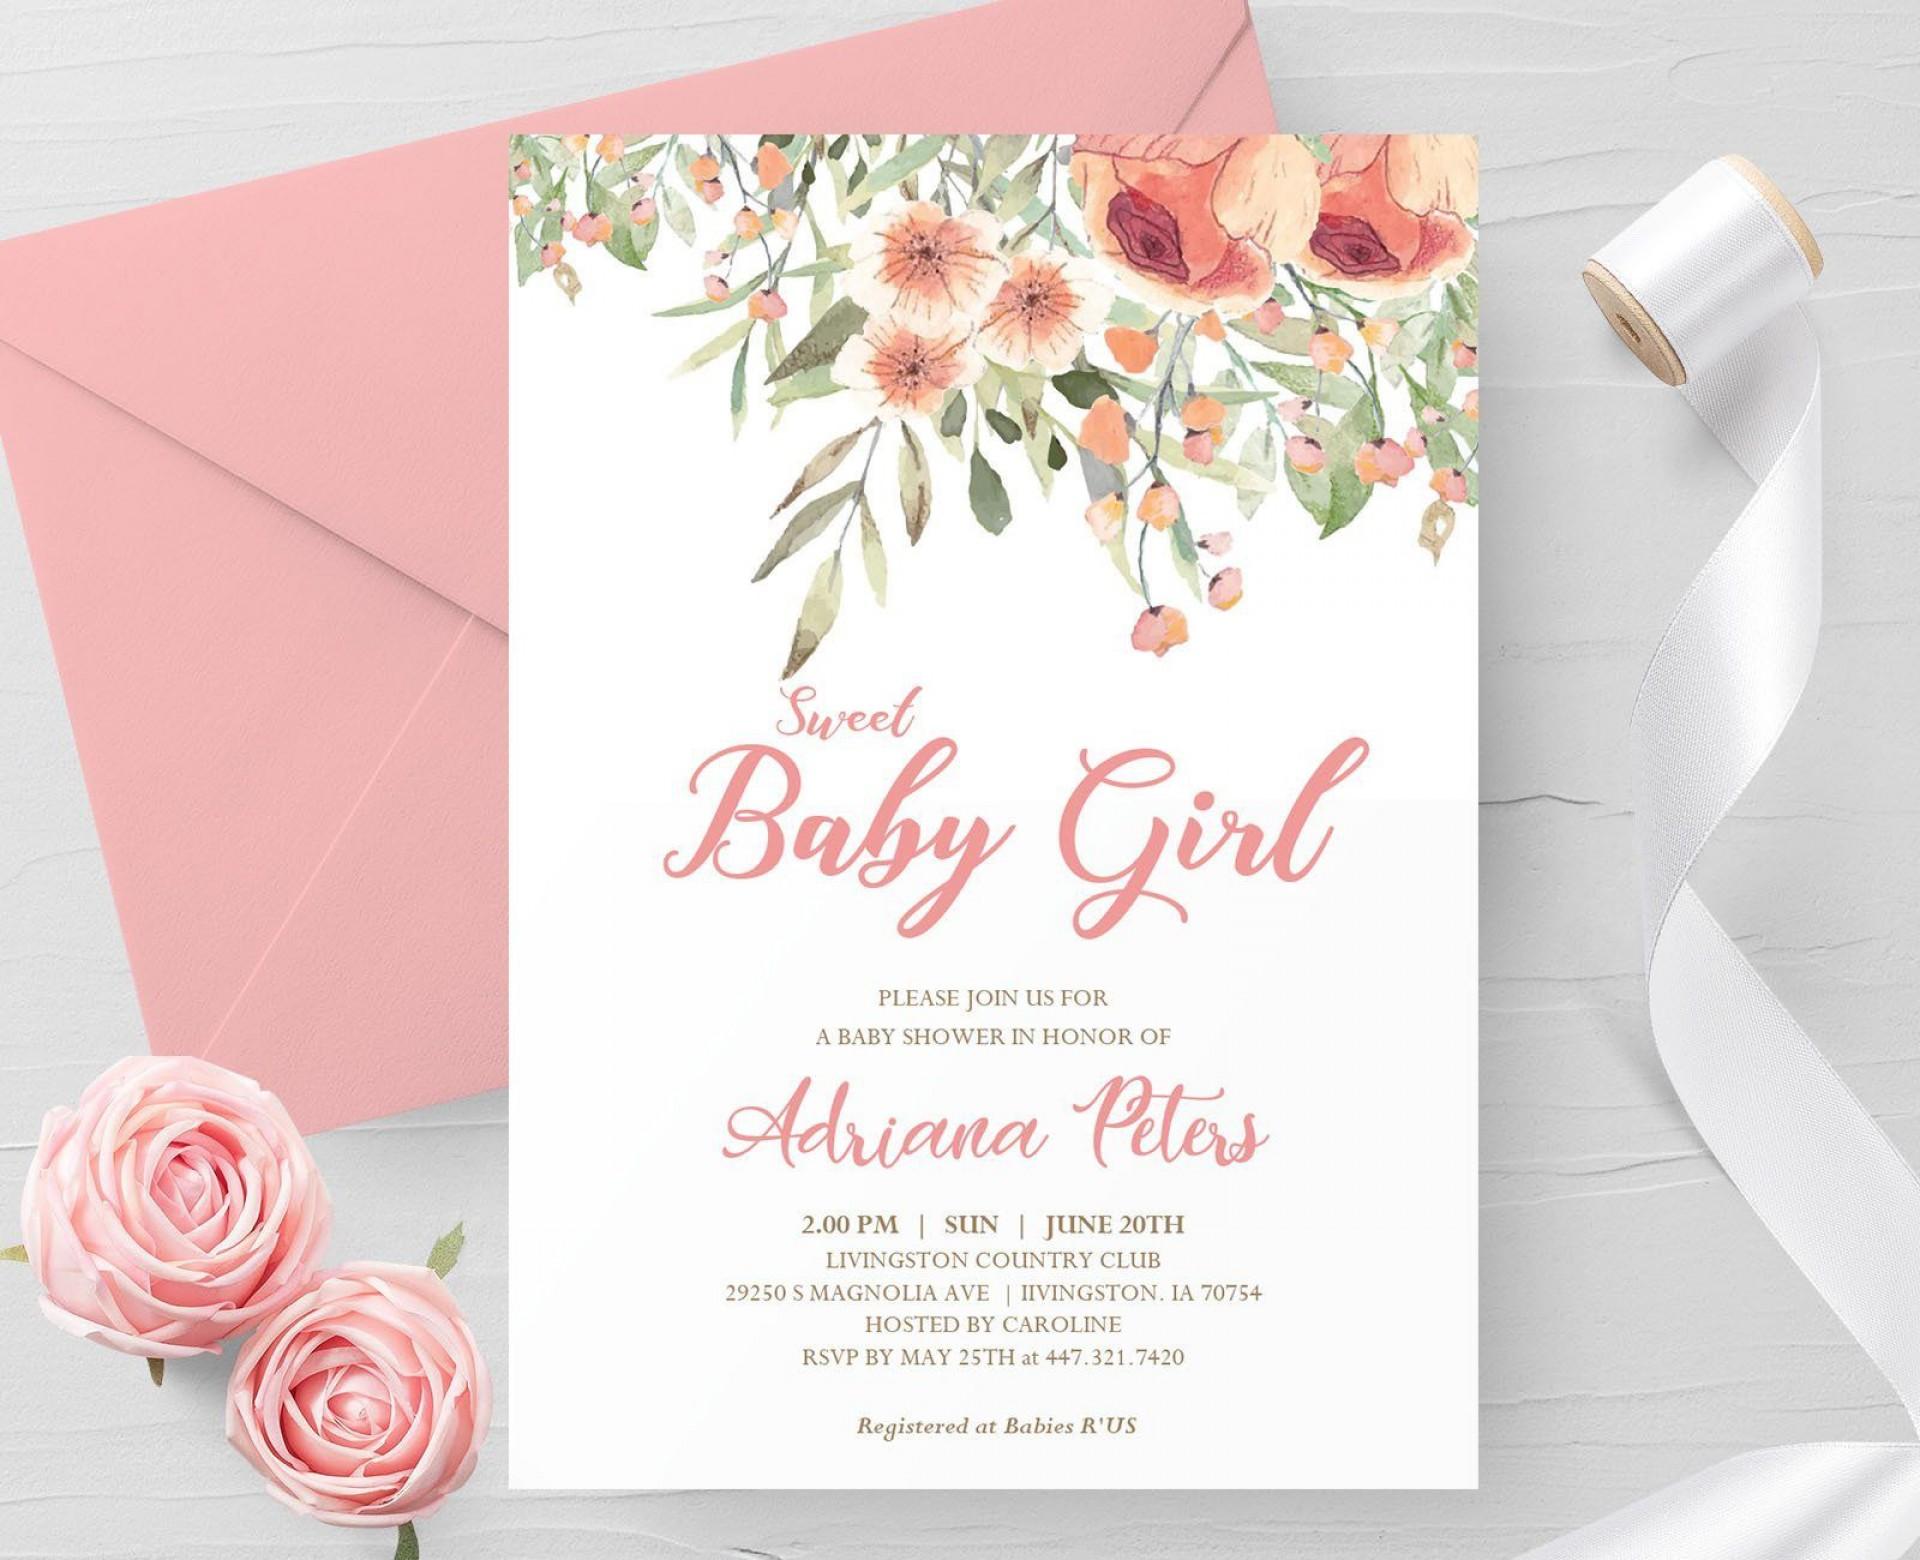 000 Staggering Free Baby Shower Invitation Template Editable High Def  Digital Microsoft Word1920